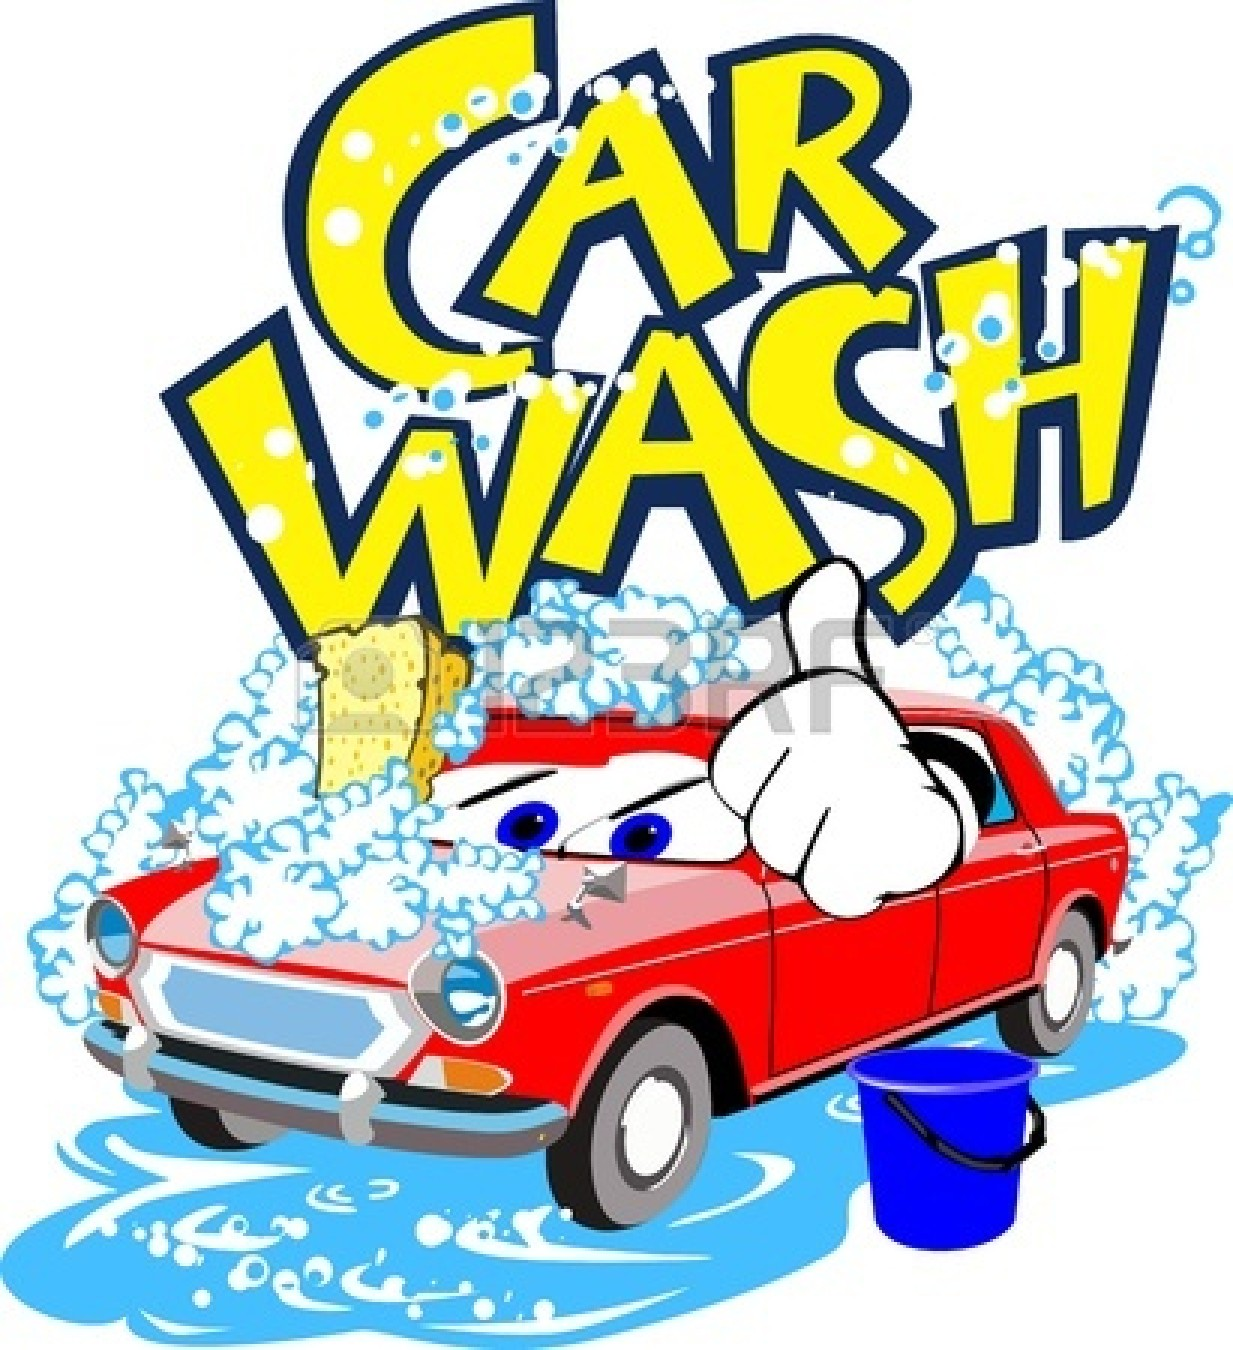 Car Wash Clipart Black And White 14234286 Car Wash Jpg